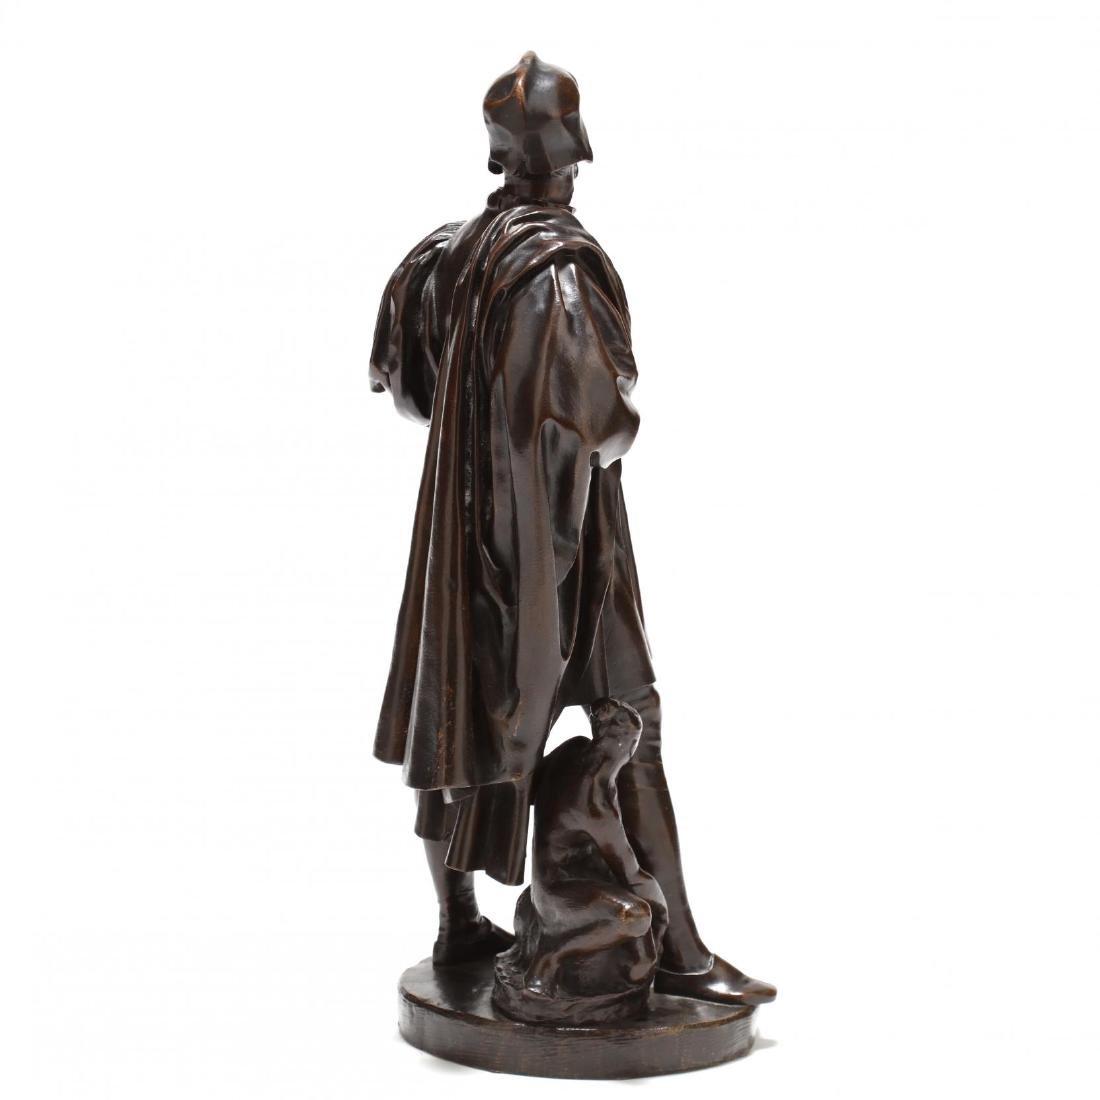 Antique Bronze Sculpture of a Renaissance Man - 4